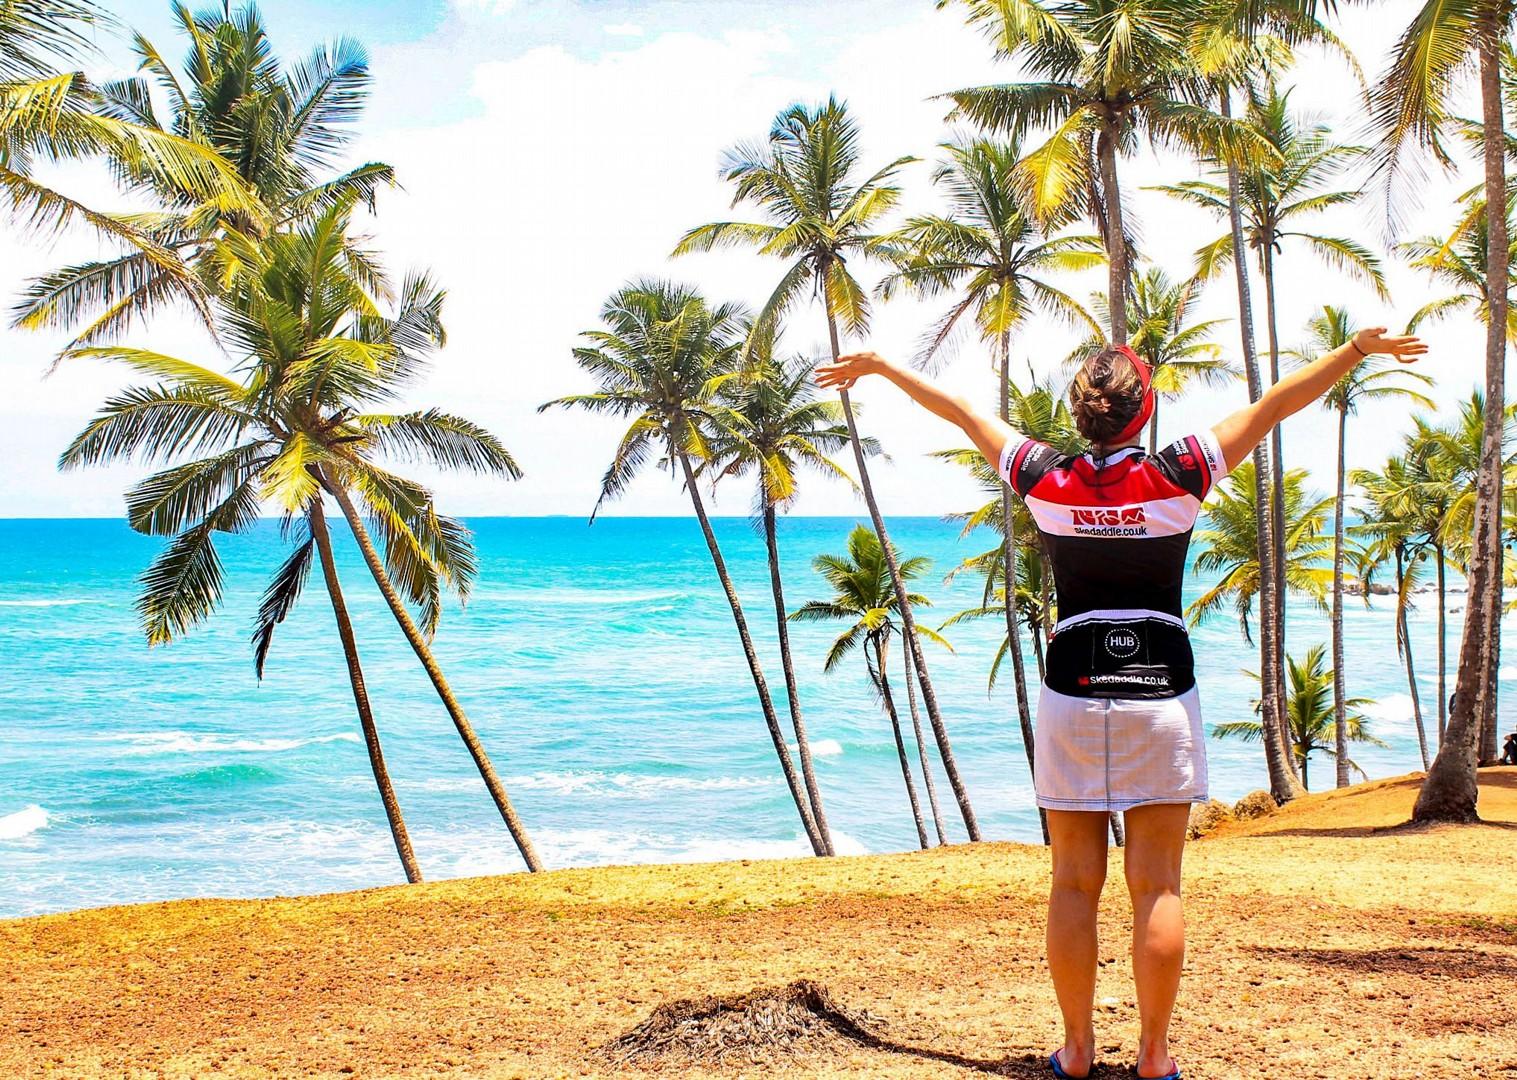 IMG_4506.jpg - Sri Lanka - Backroads and Beaches - Cycling Adventures